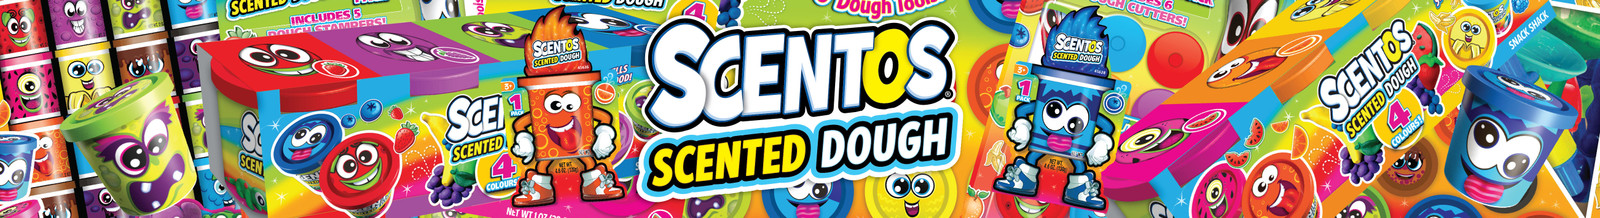 Scentos Dough